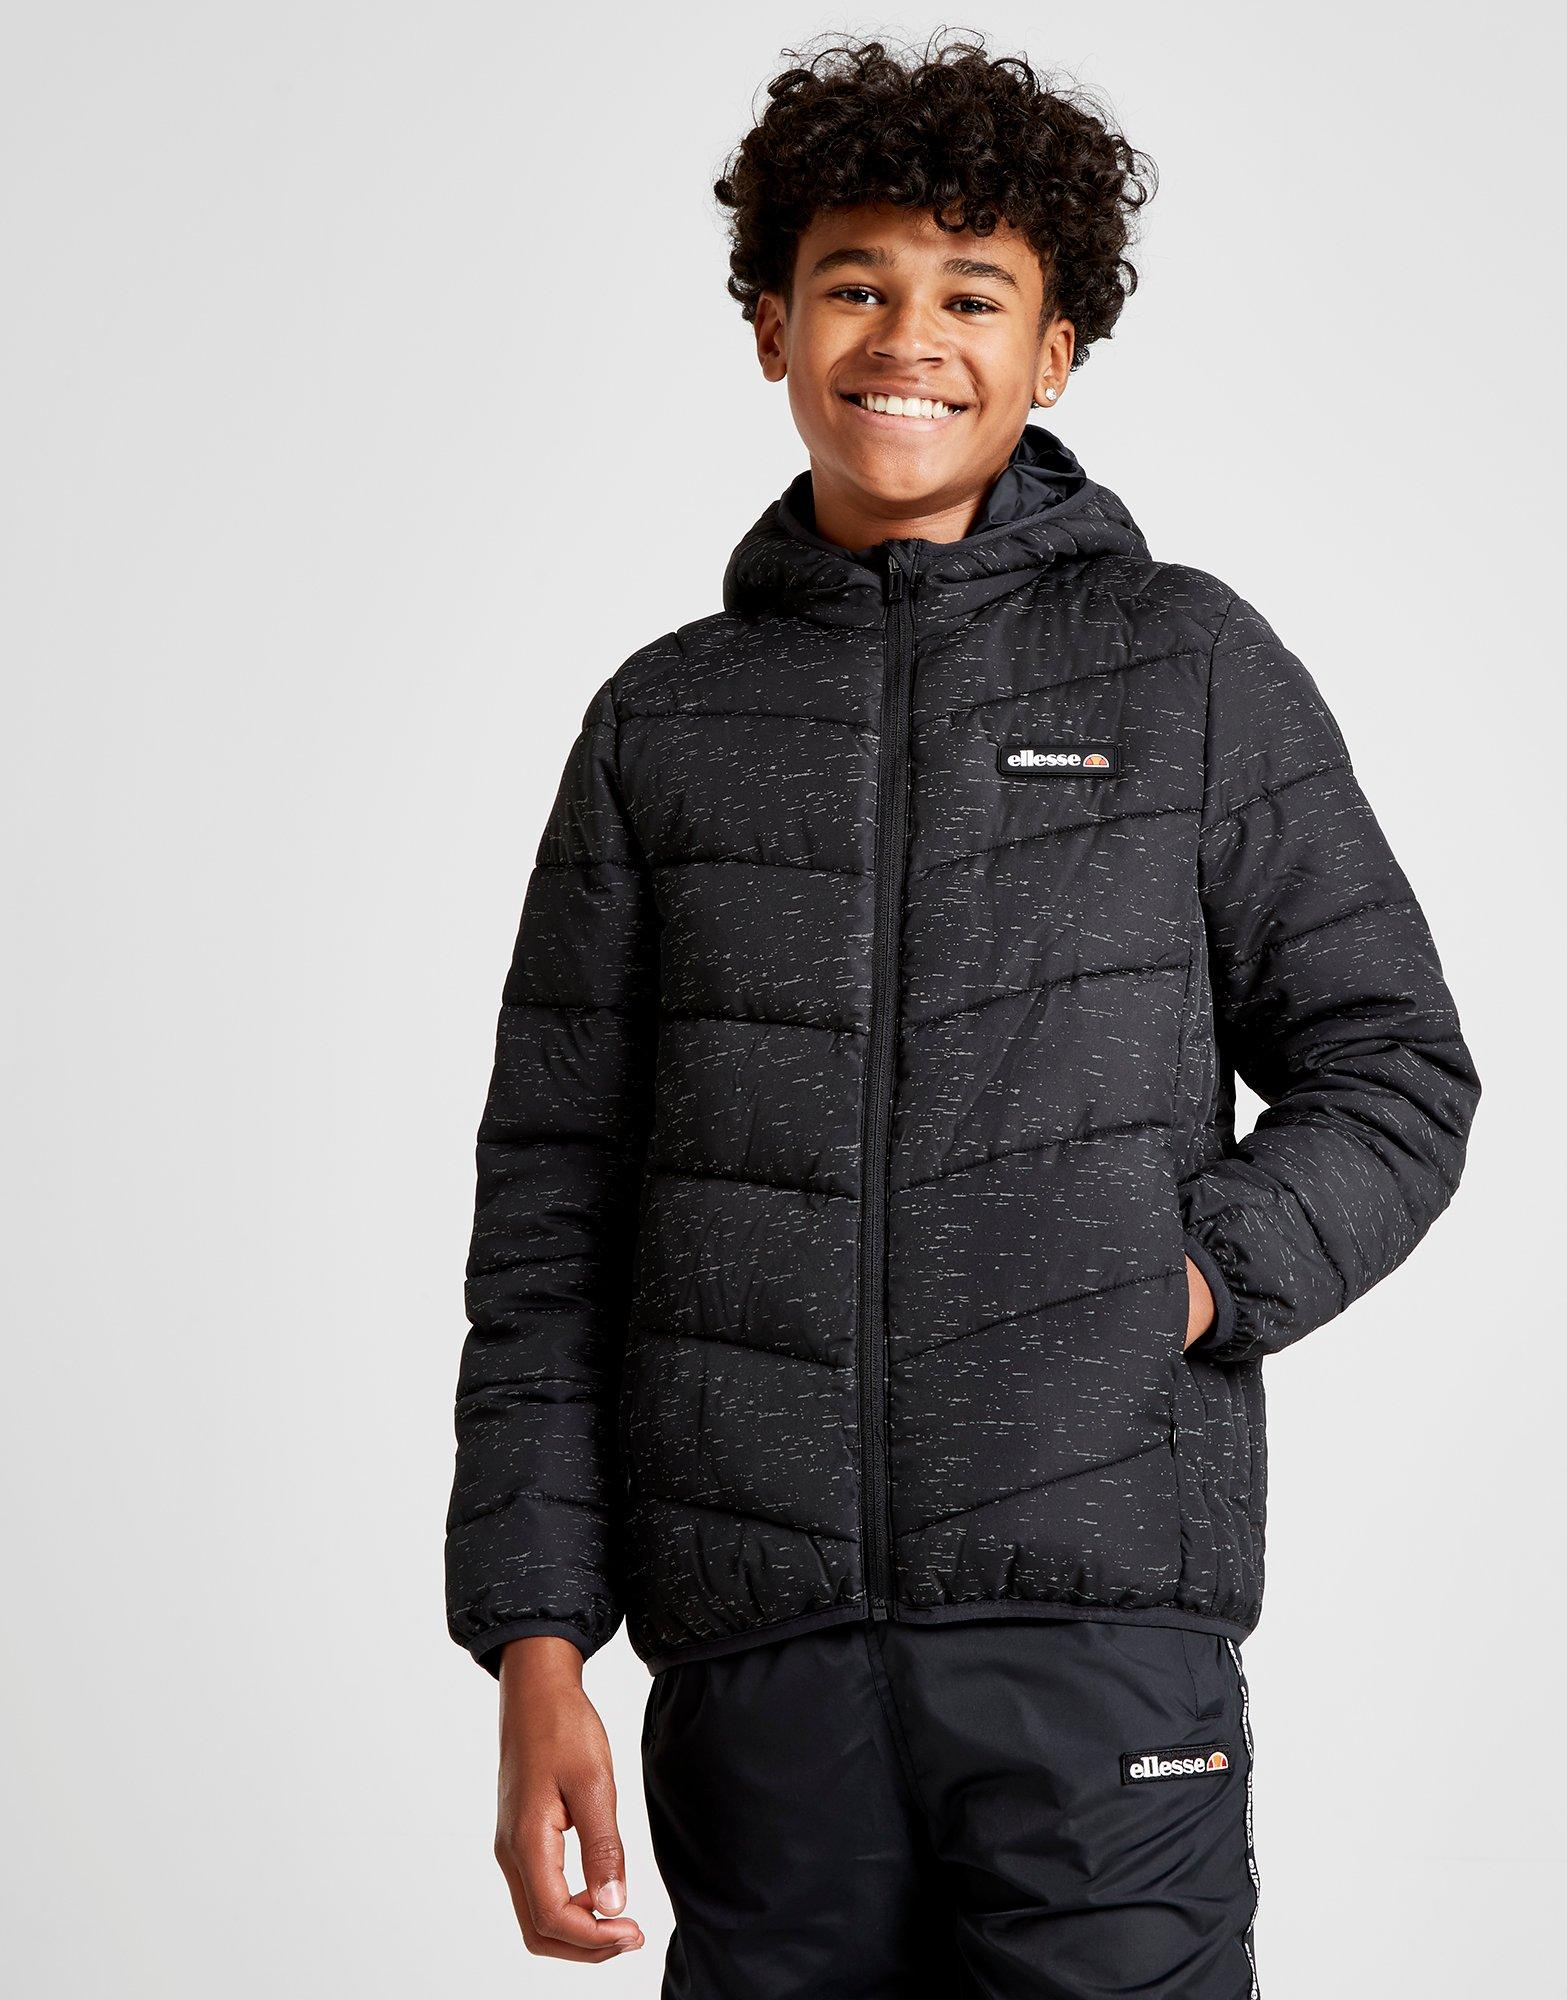 meet top-rated original discount price Details about New Ellesse Junior's Osvaldo Speckle Full Zip Long Sleeve  Jacket Black